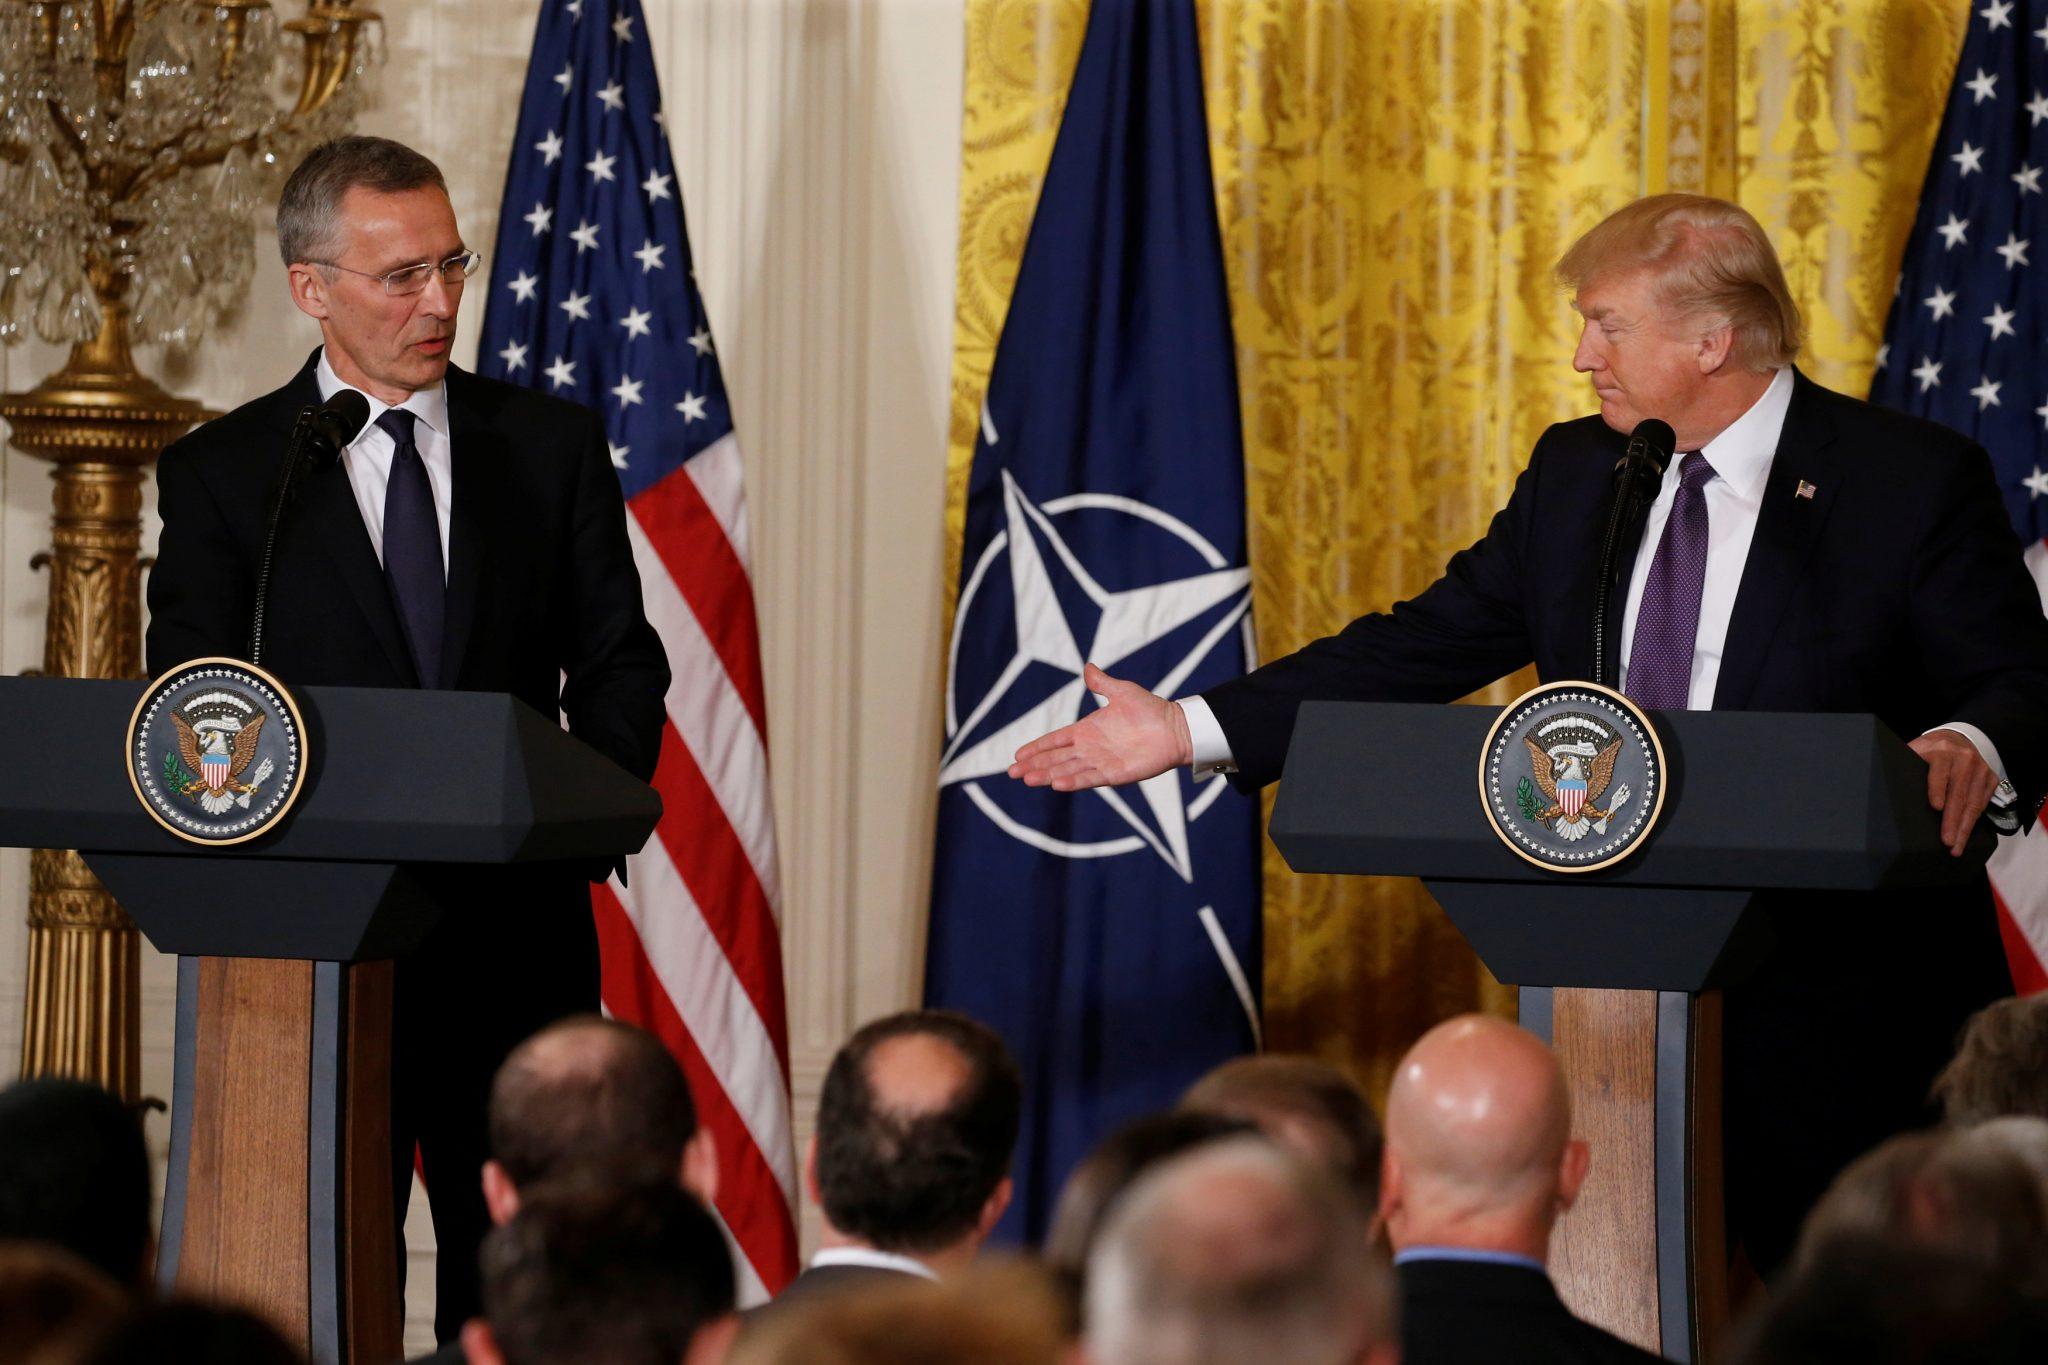 2017 04 12T211353Z 181692619 RC19C79AEC00 RTRMADP 3 US NATO